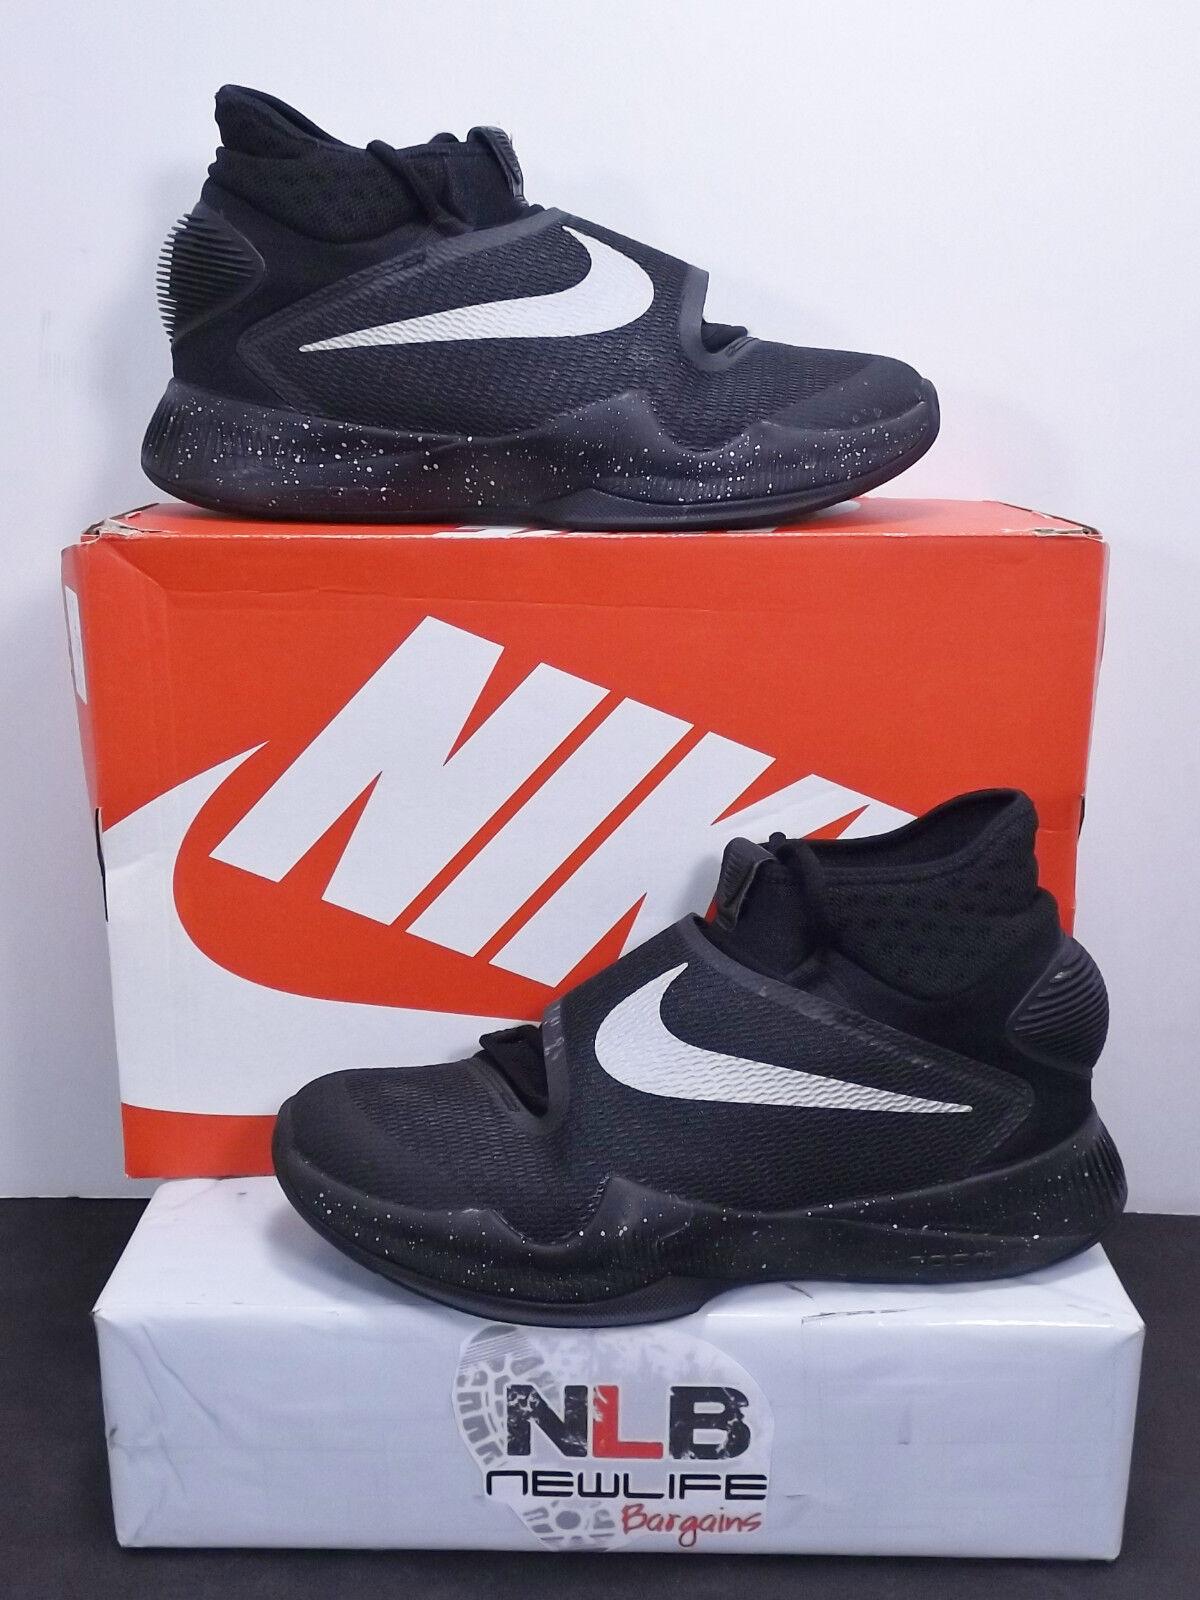 2018 Nike Zoom Hyperrev TB 820224-001 Black/Metallic Silver Men's Comfortable